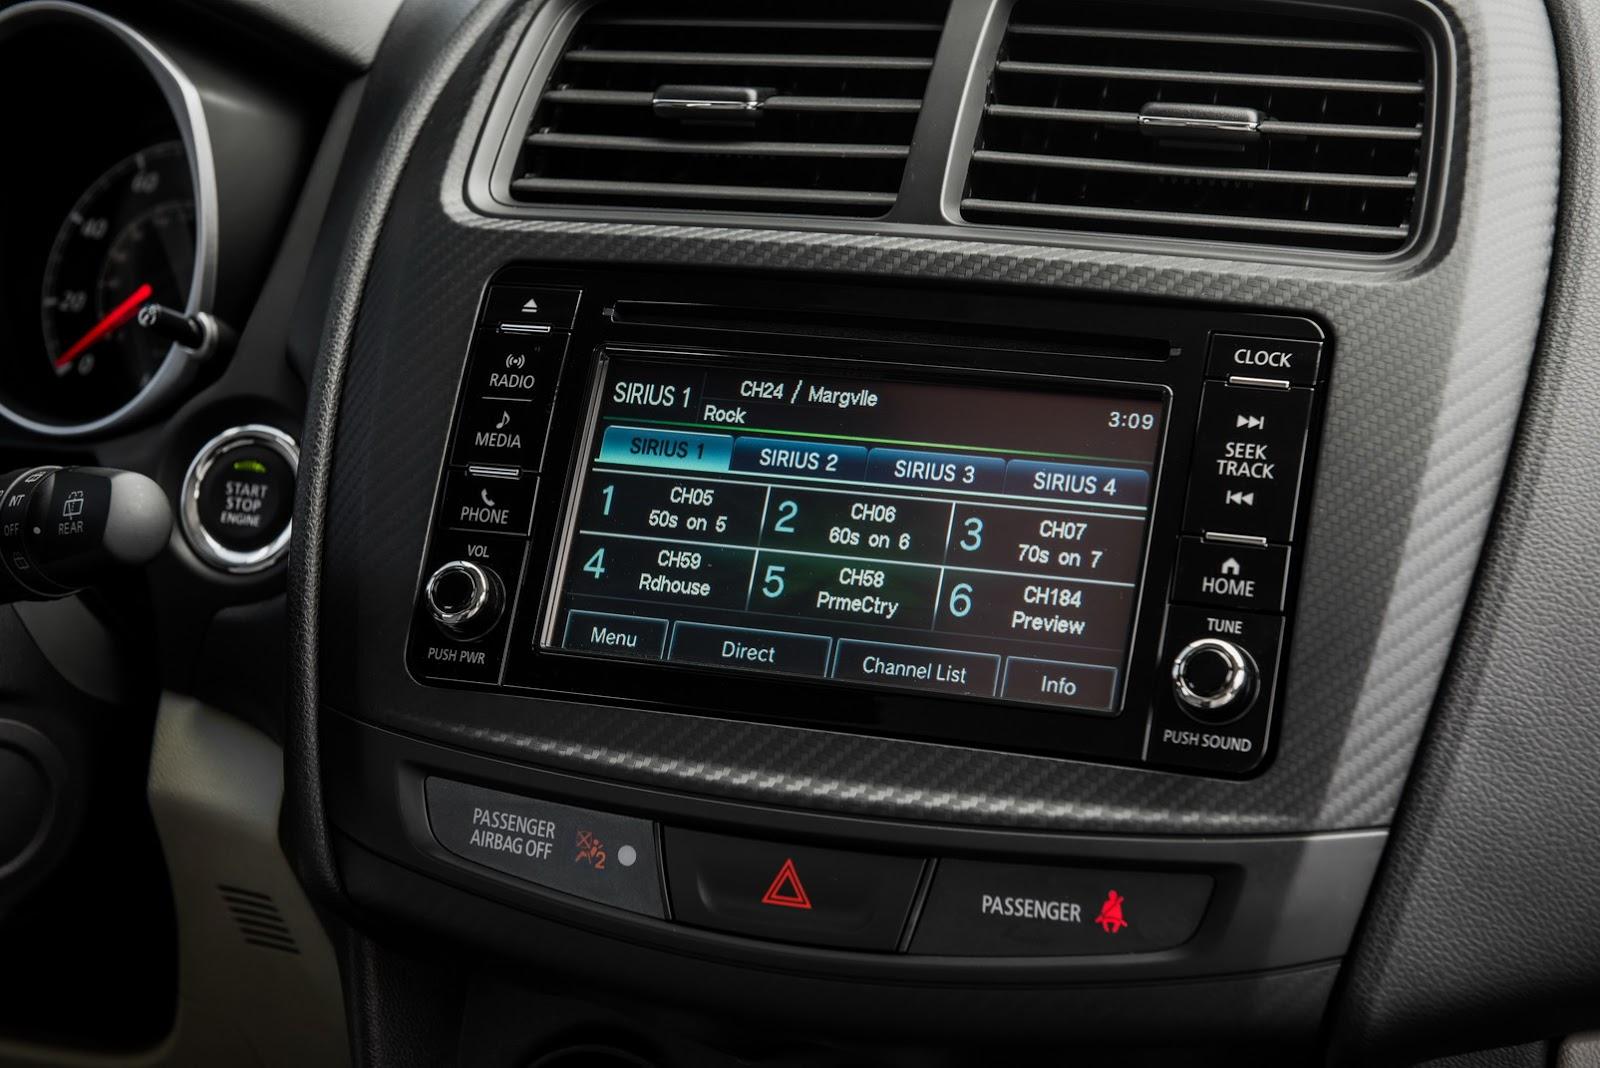 2016 Mitsubishi Outlander Sport Adds Dynamic Shield Grille